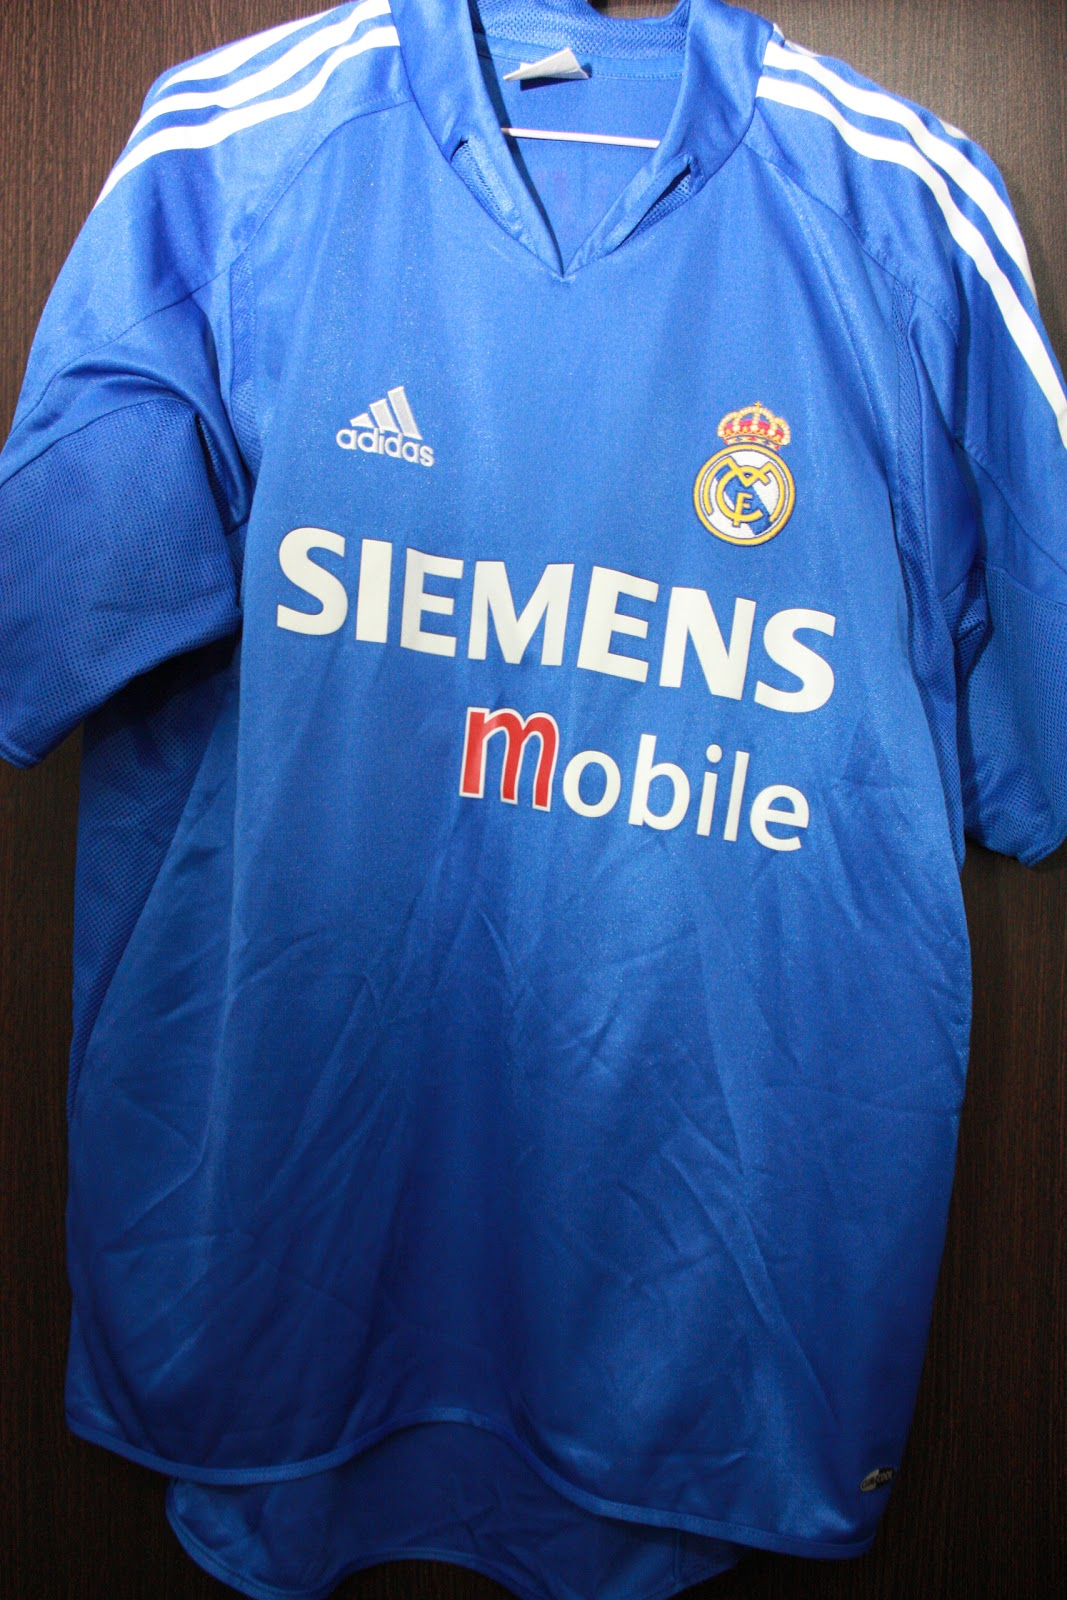 45b1be5eab5 Real Madrid 3rd Kit 2004 05 - BECKHAM  23